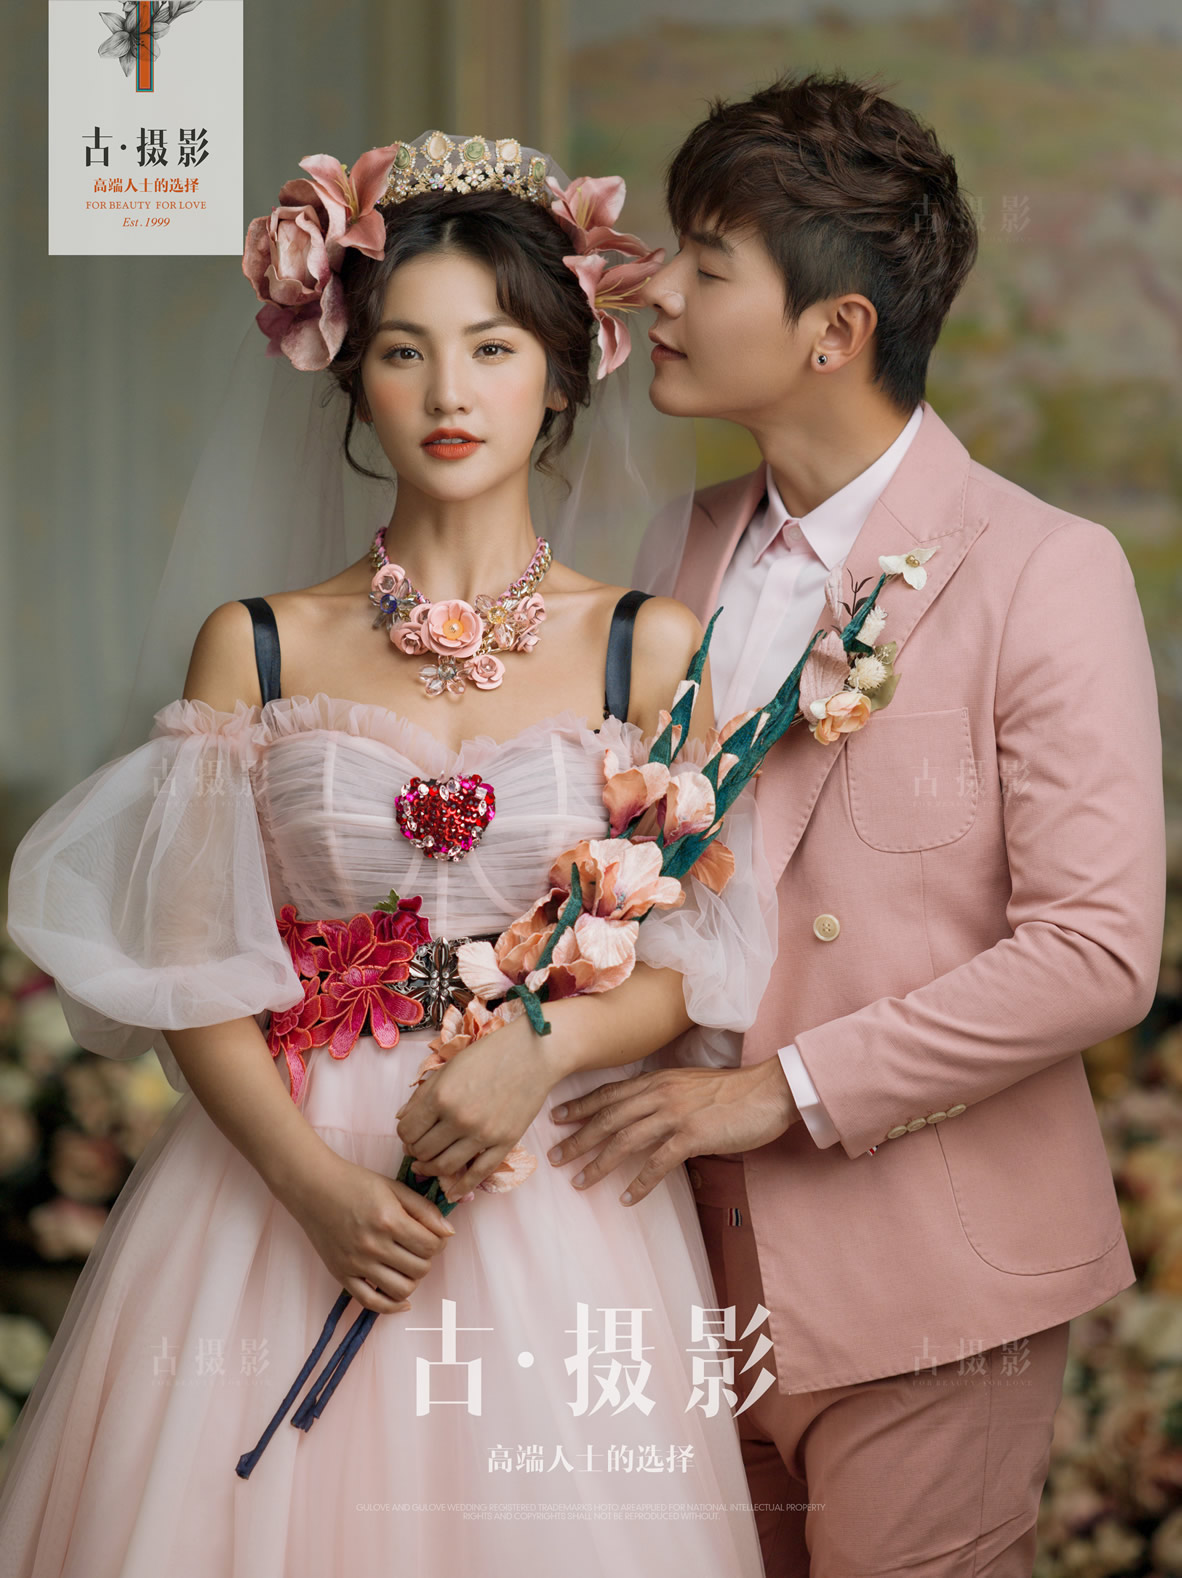 GRACE - 明星范 - love昆明古摄影-昆明婚纱摄影网